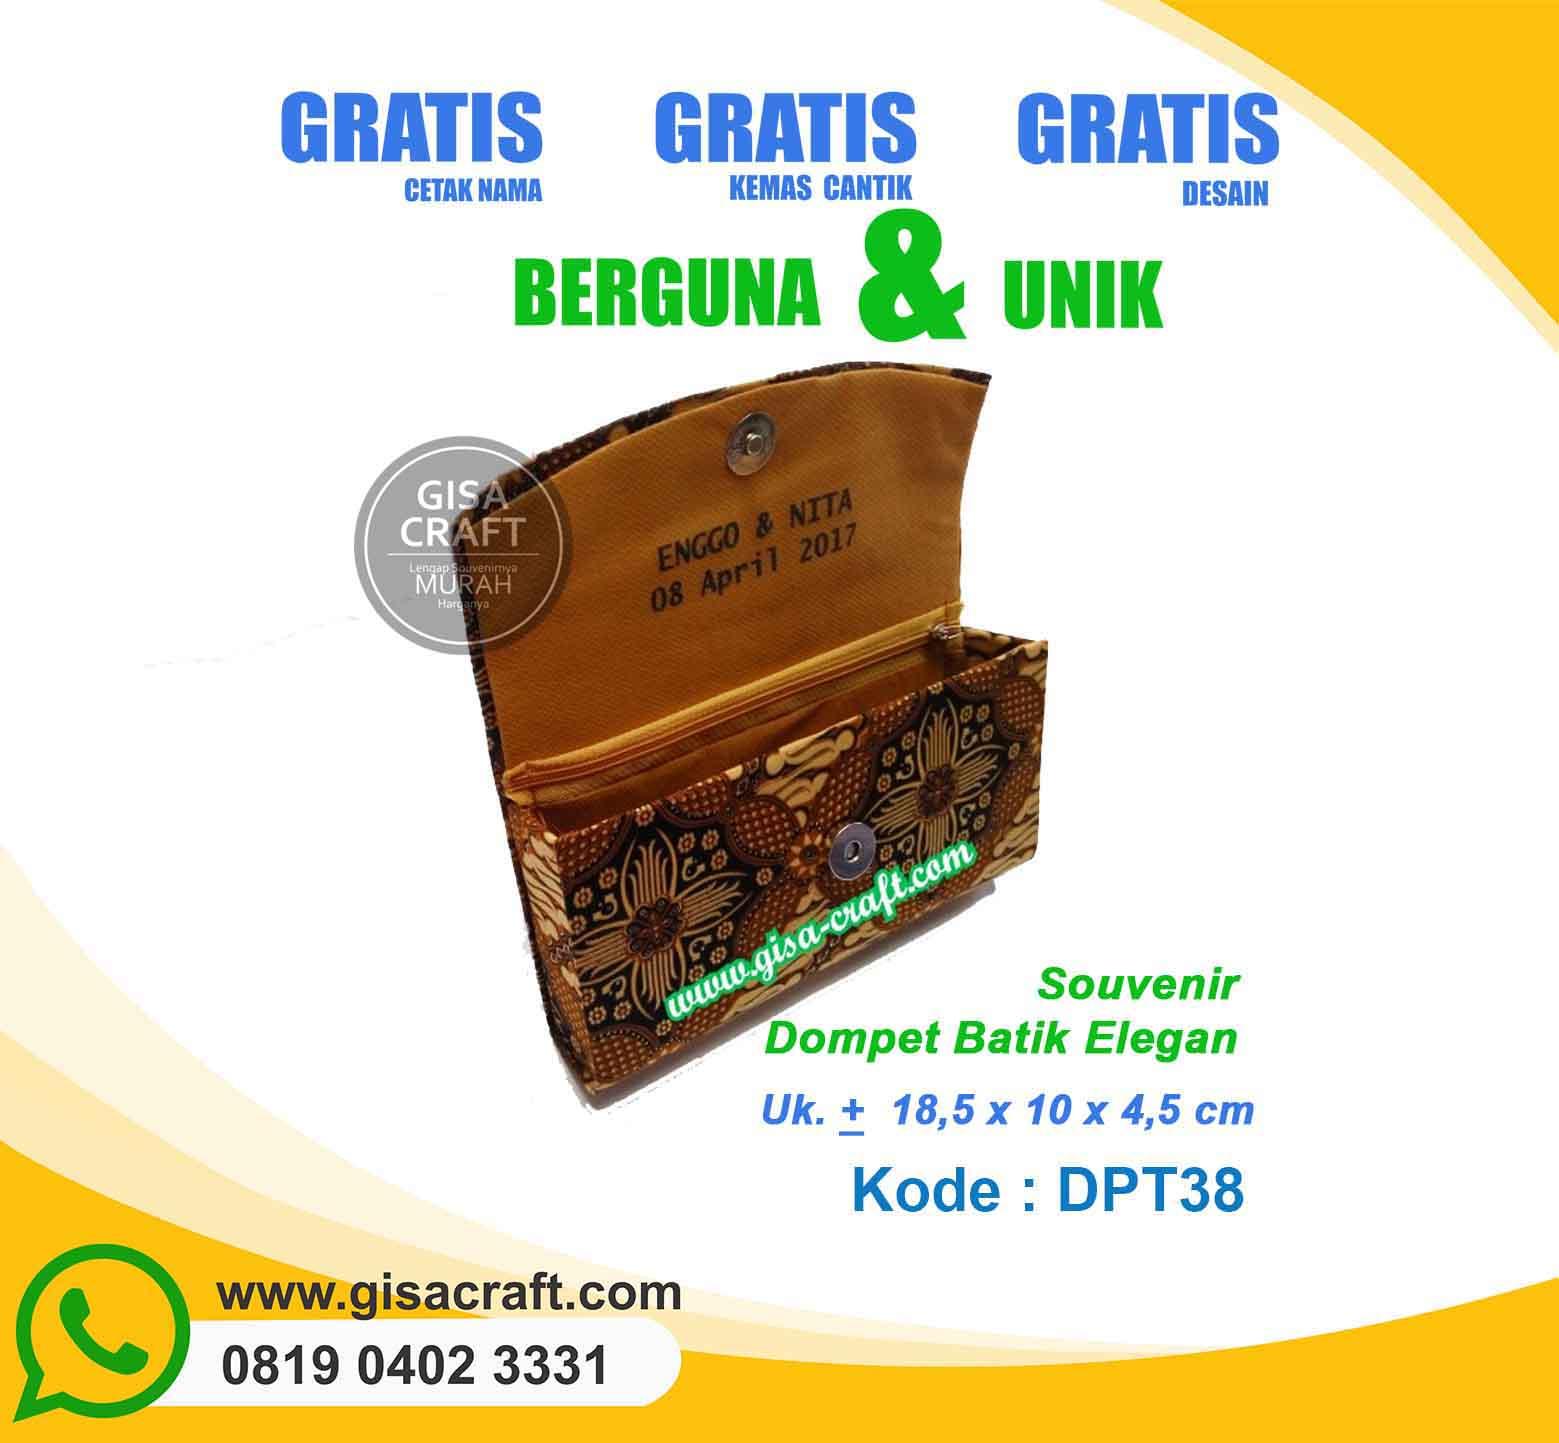 Dompet Batik DPT38